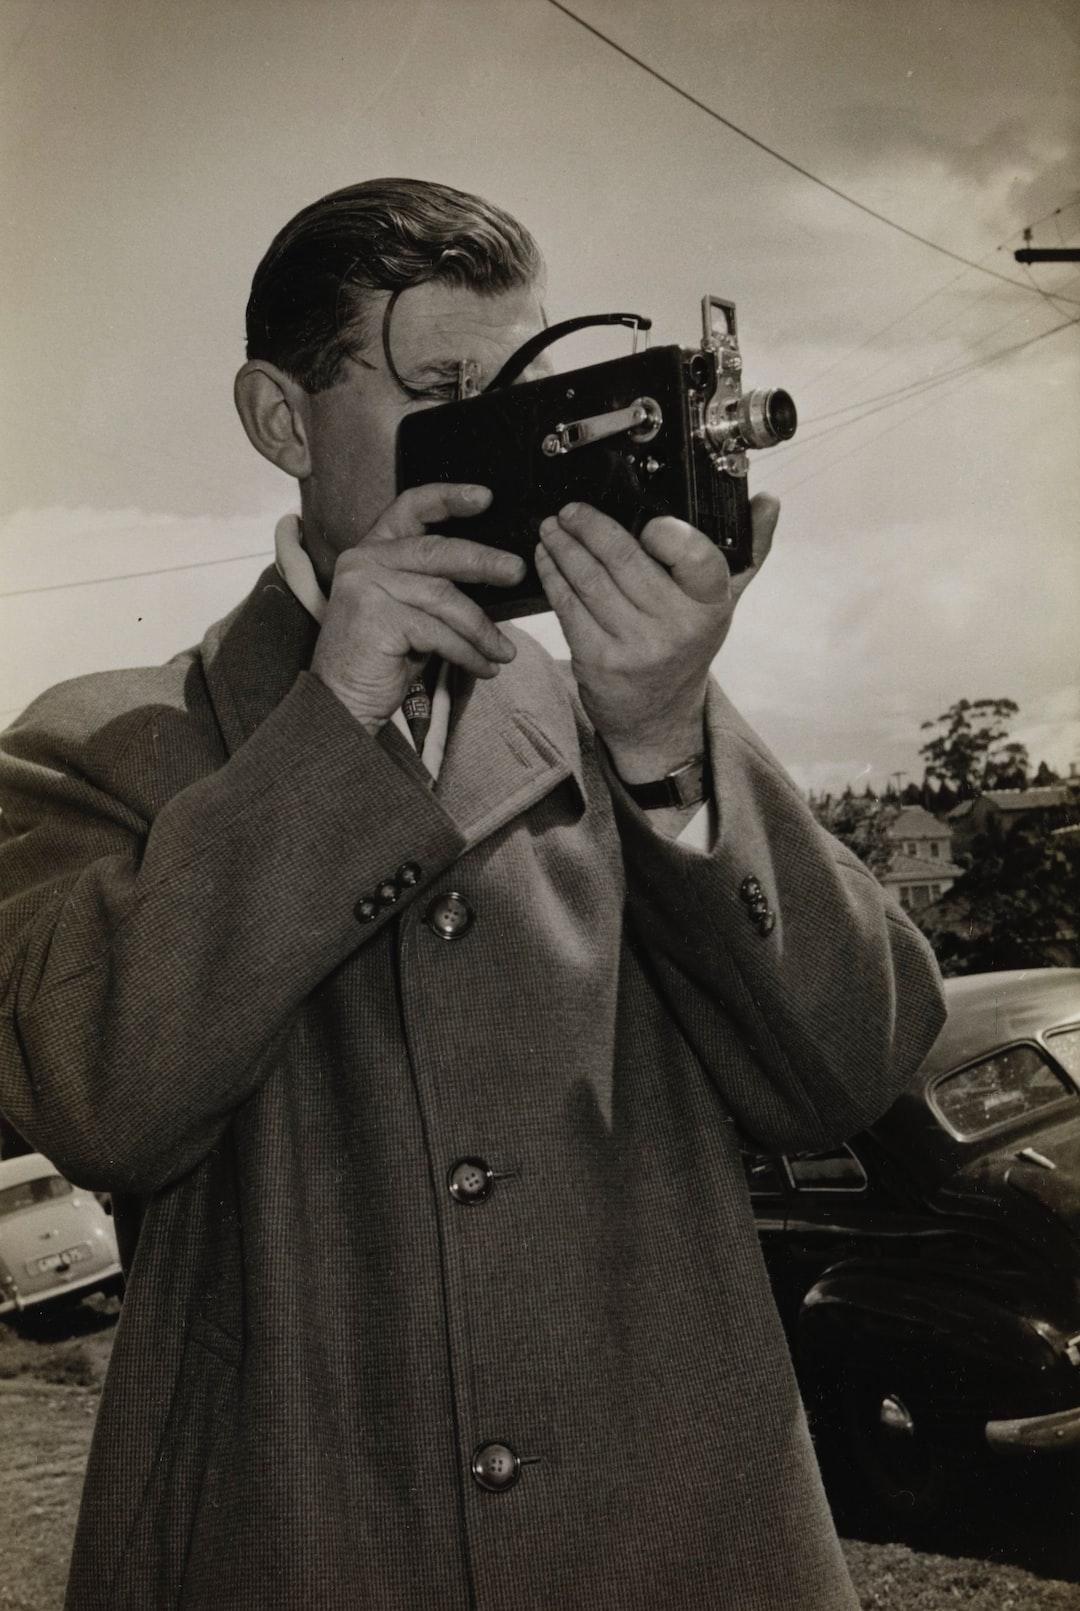 Ken Turner Using Kodak Camera, Melbourne, circa 1940s